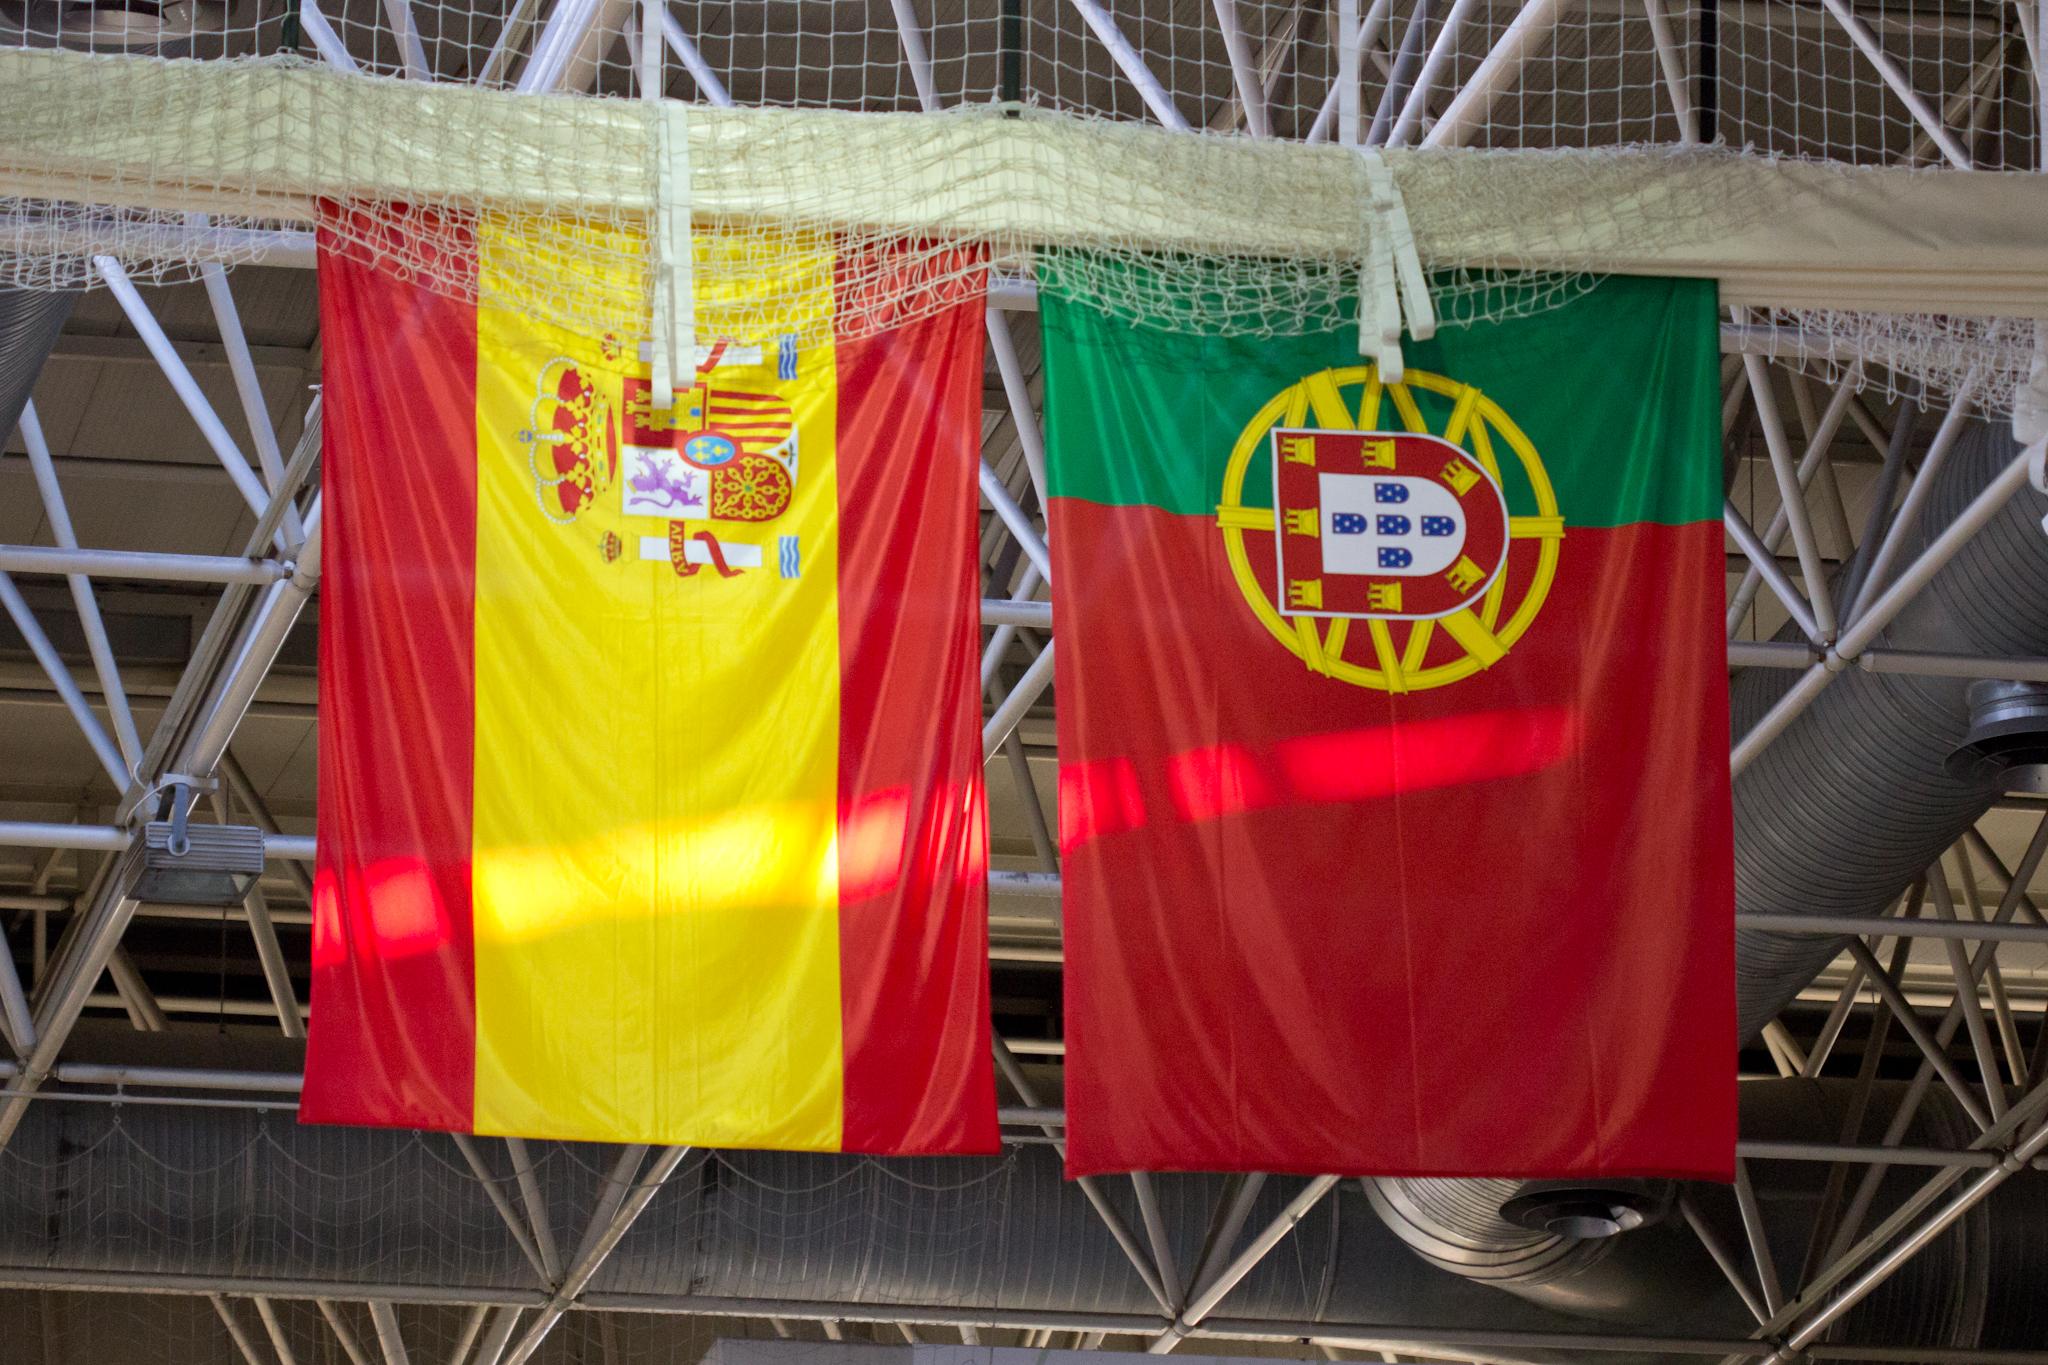 Spain And Portugal-ის სურათის შედეგი